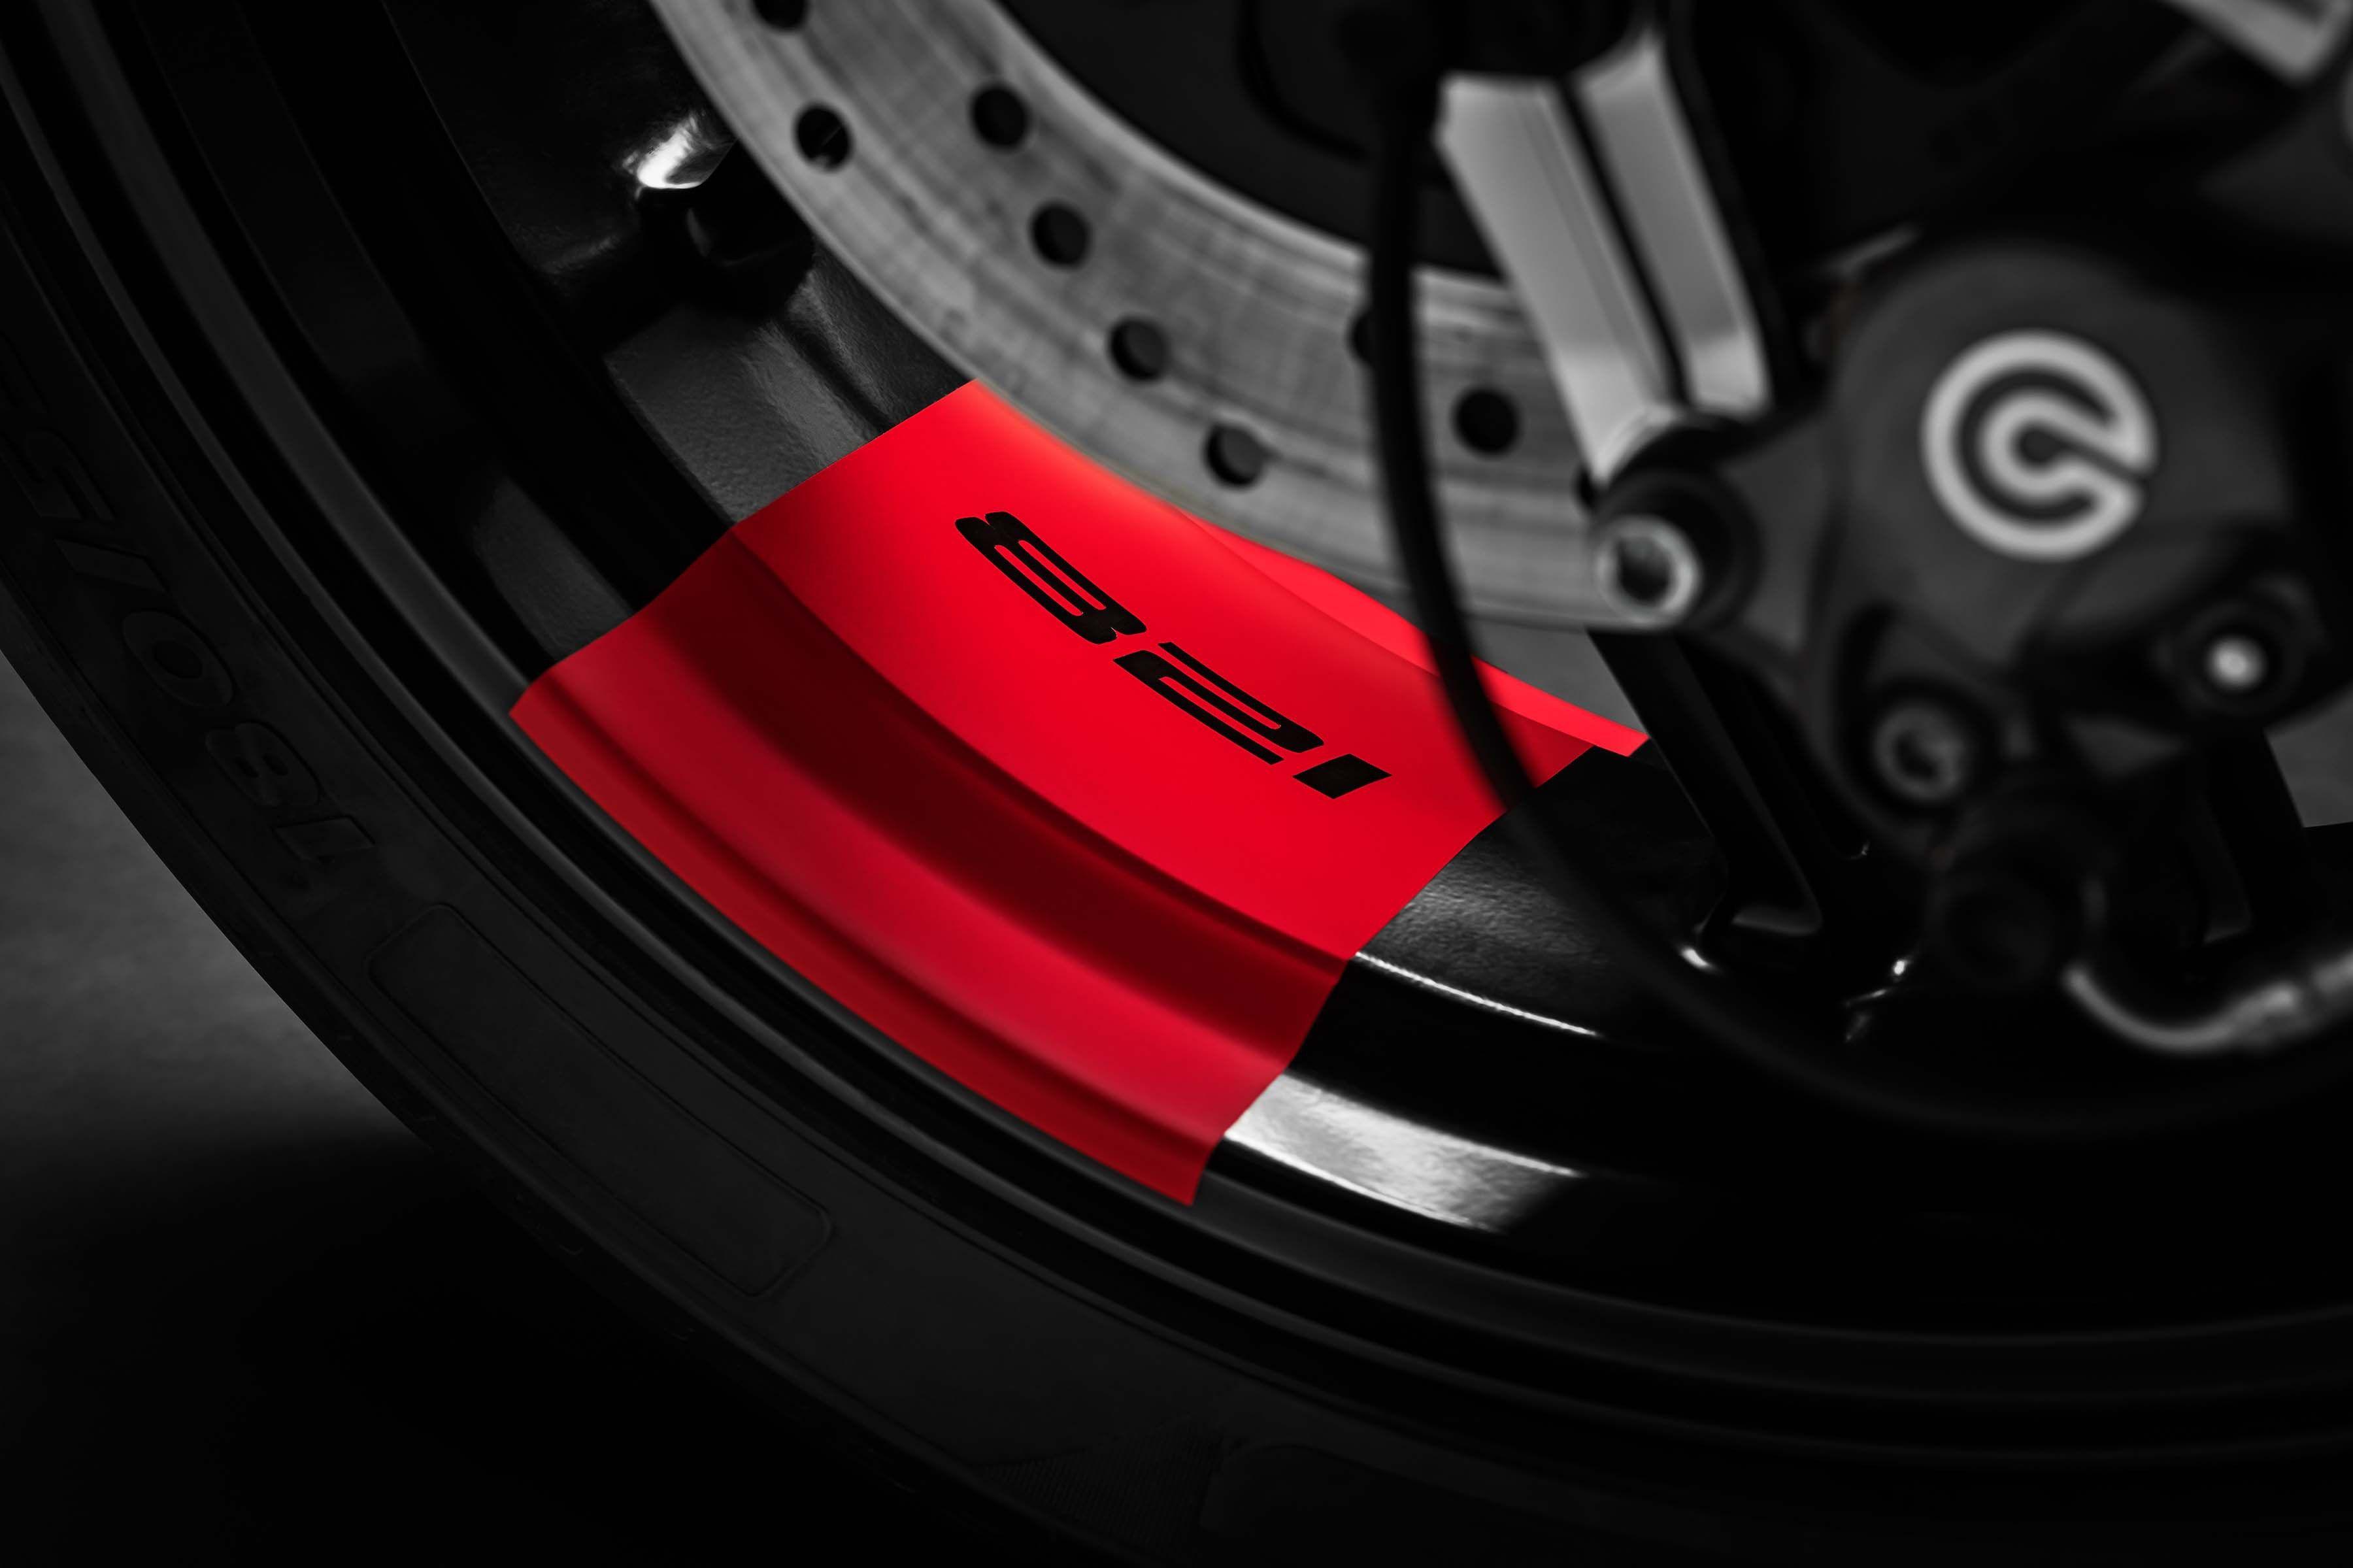 2019 Ducati Monster Stealth Ducati Monster Ducati Monster 821